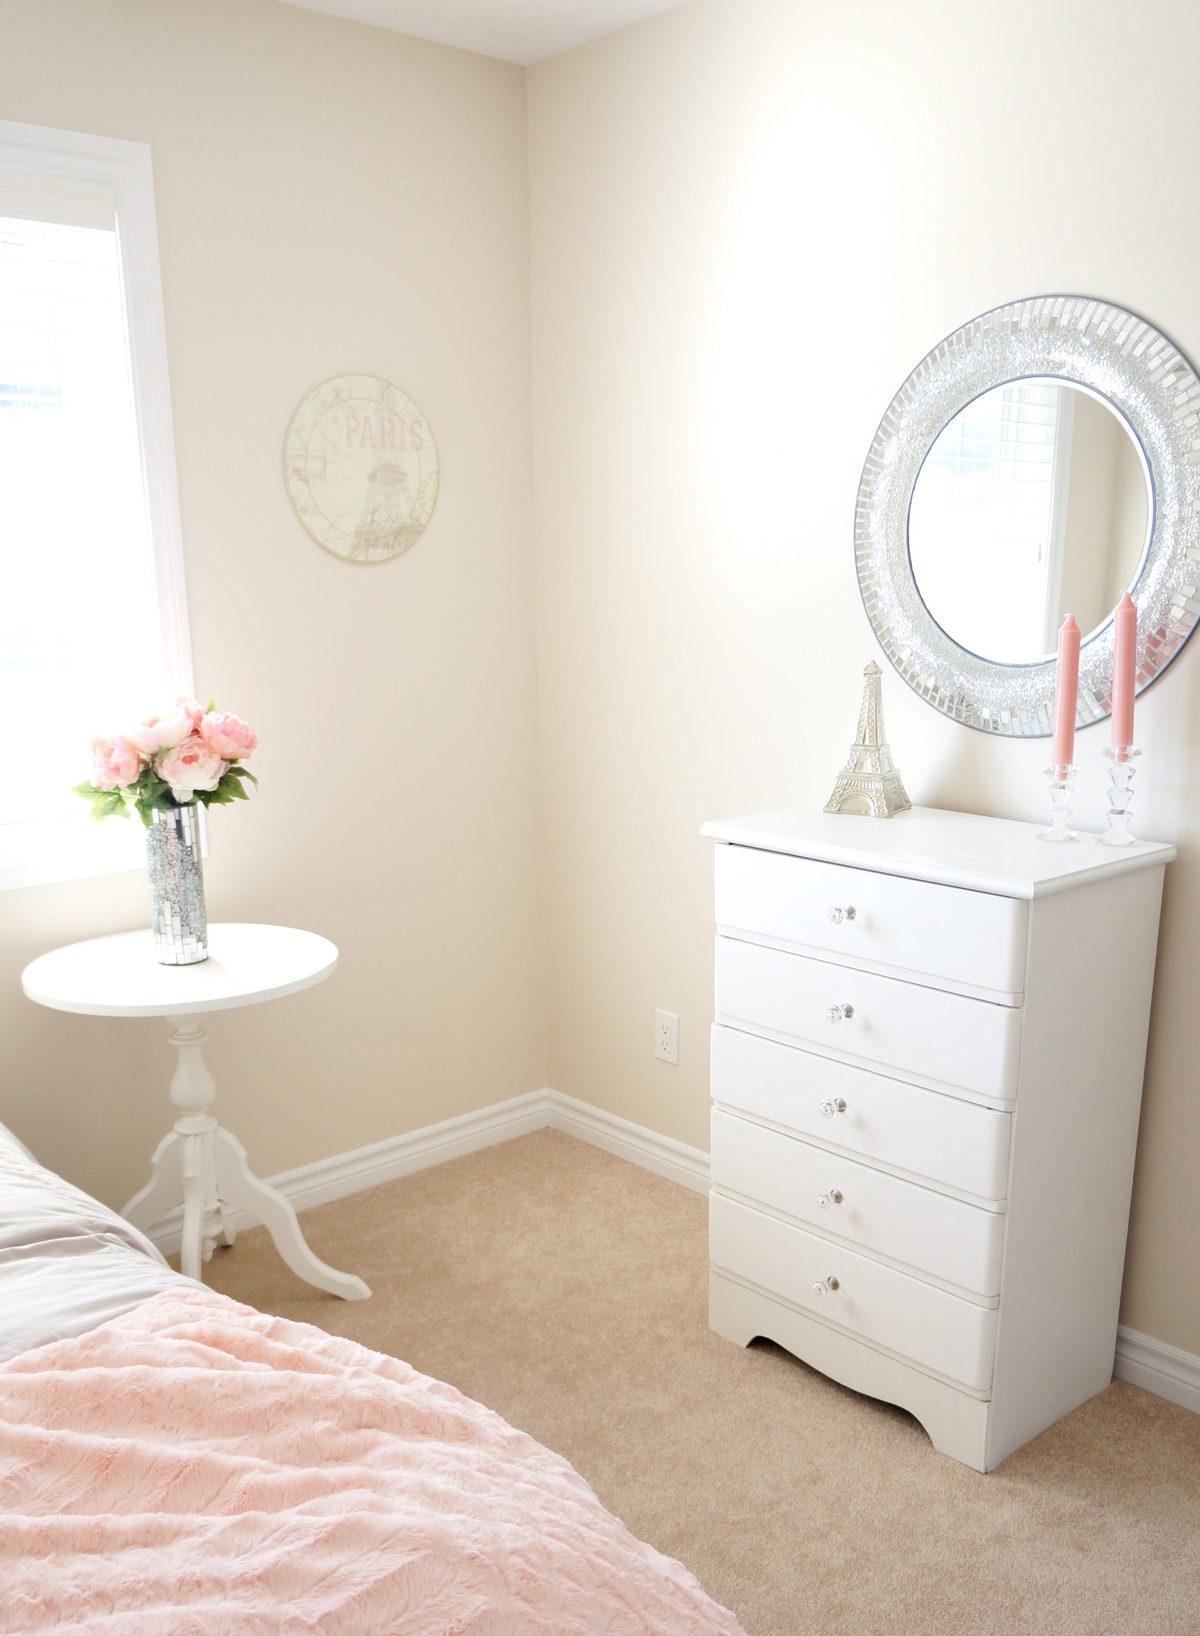 Blush Bedroom Makeover   Haute   Healthy Living. Haute   Healthy Living home Archives   Haute   Healthy Living